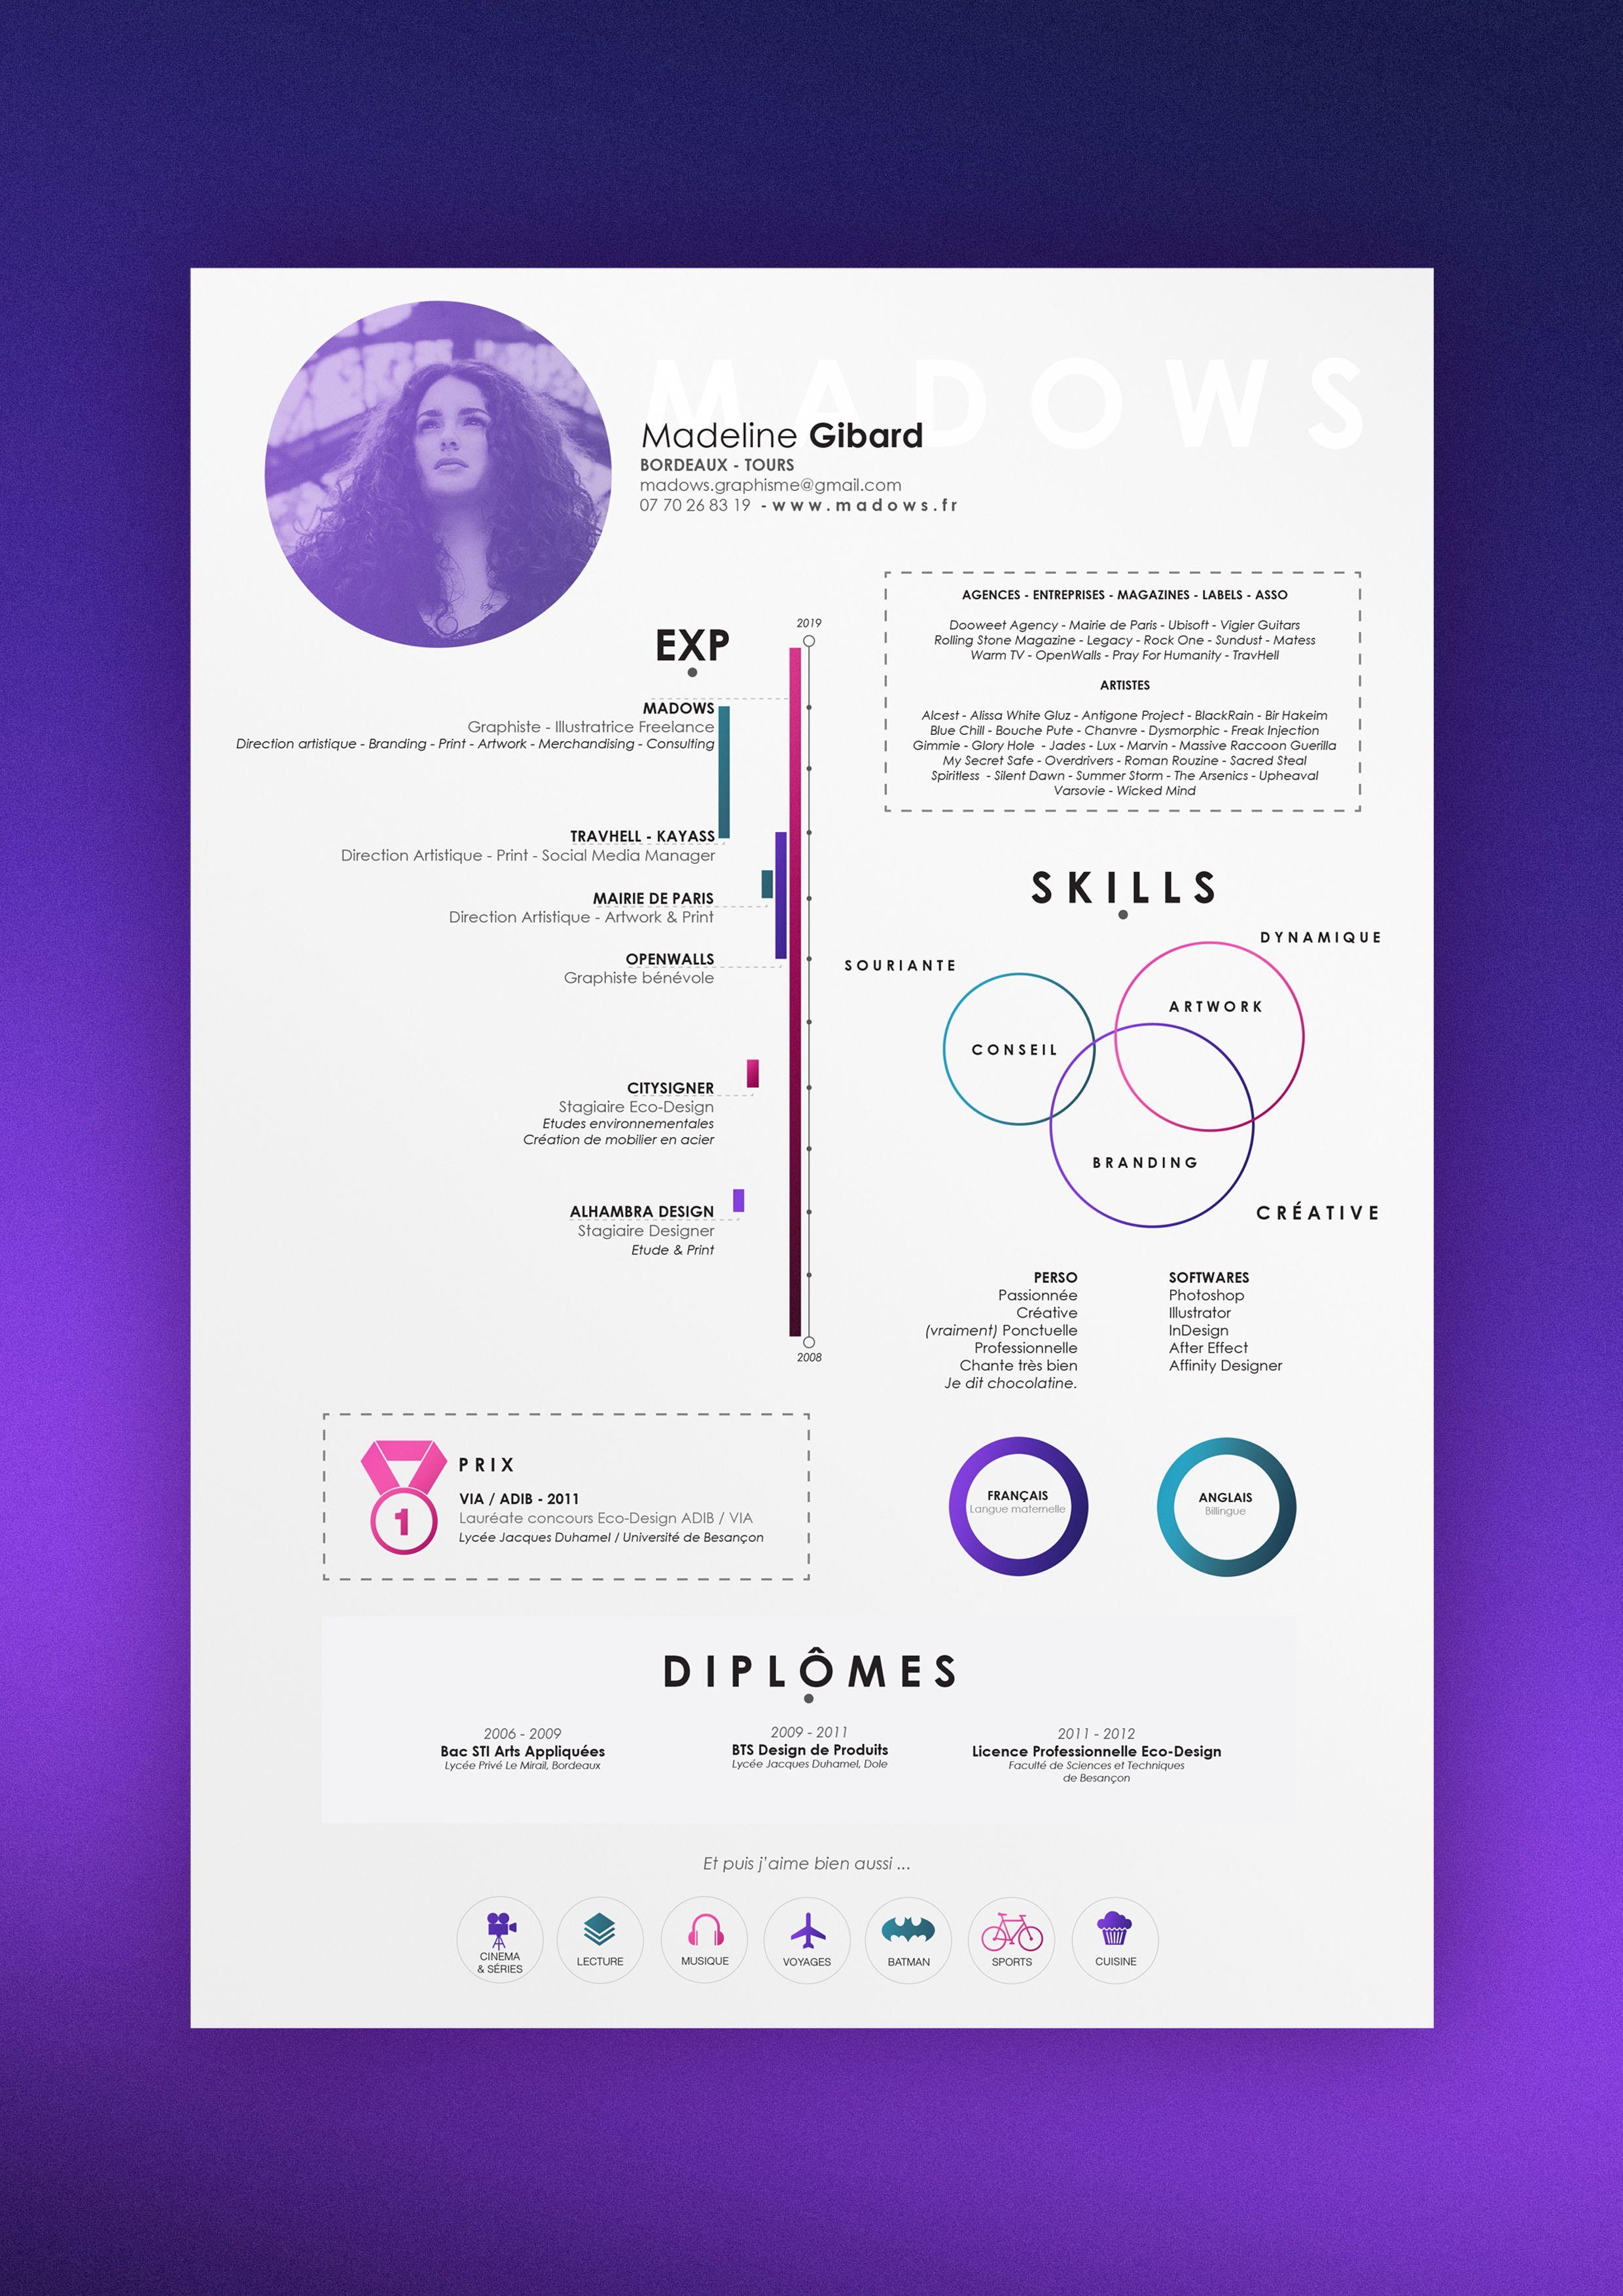 Graphic and soft Graphic Designer Resume 2019 (avec images